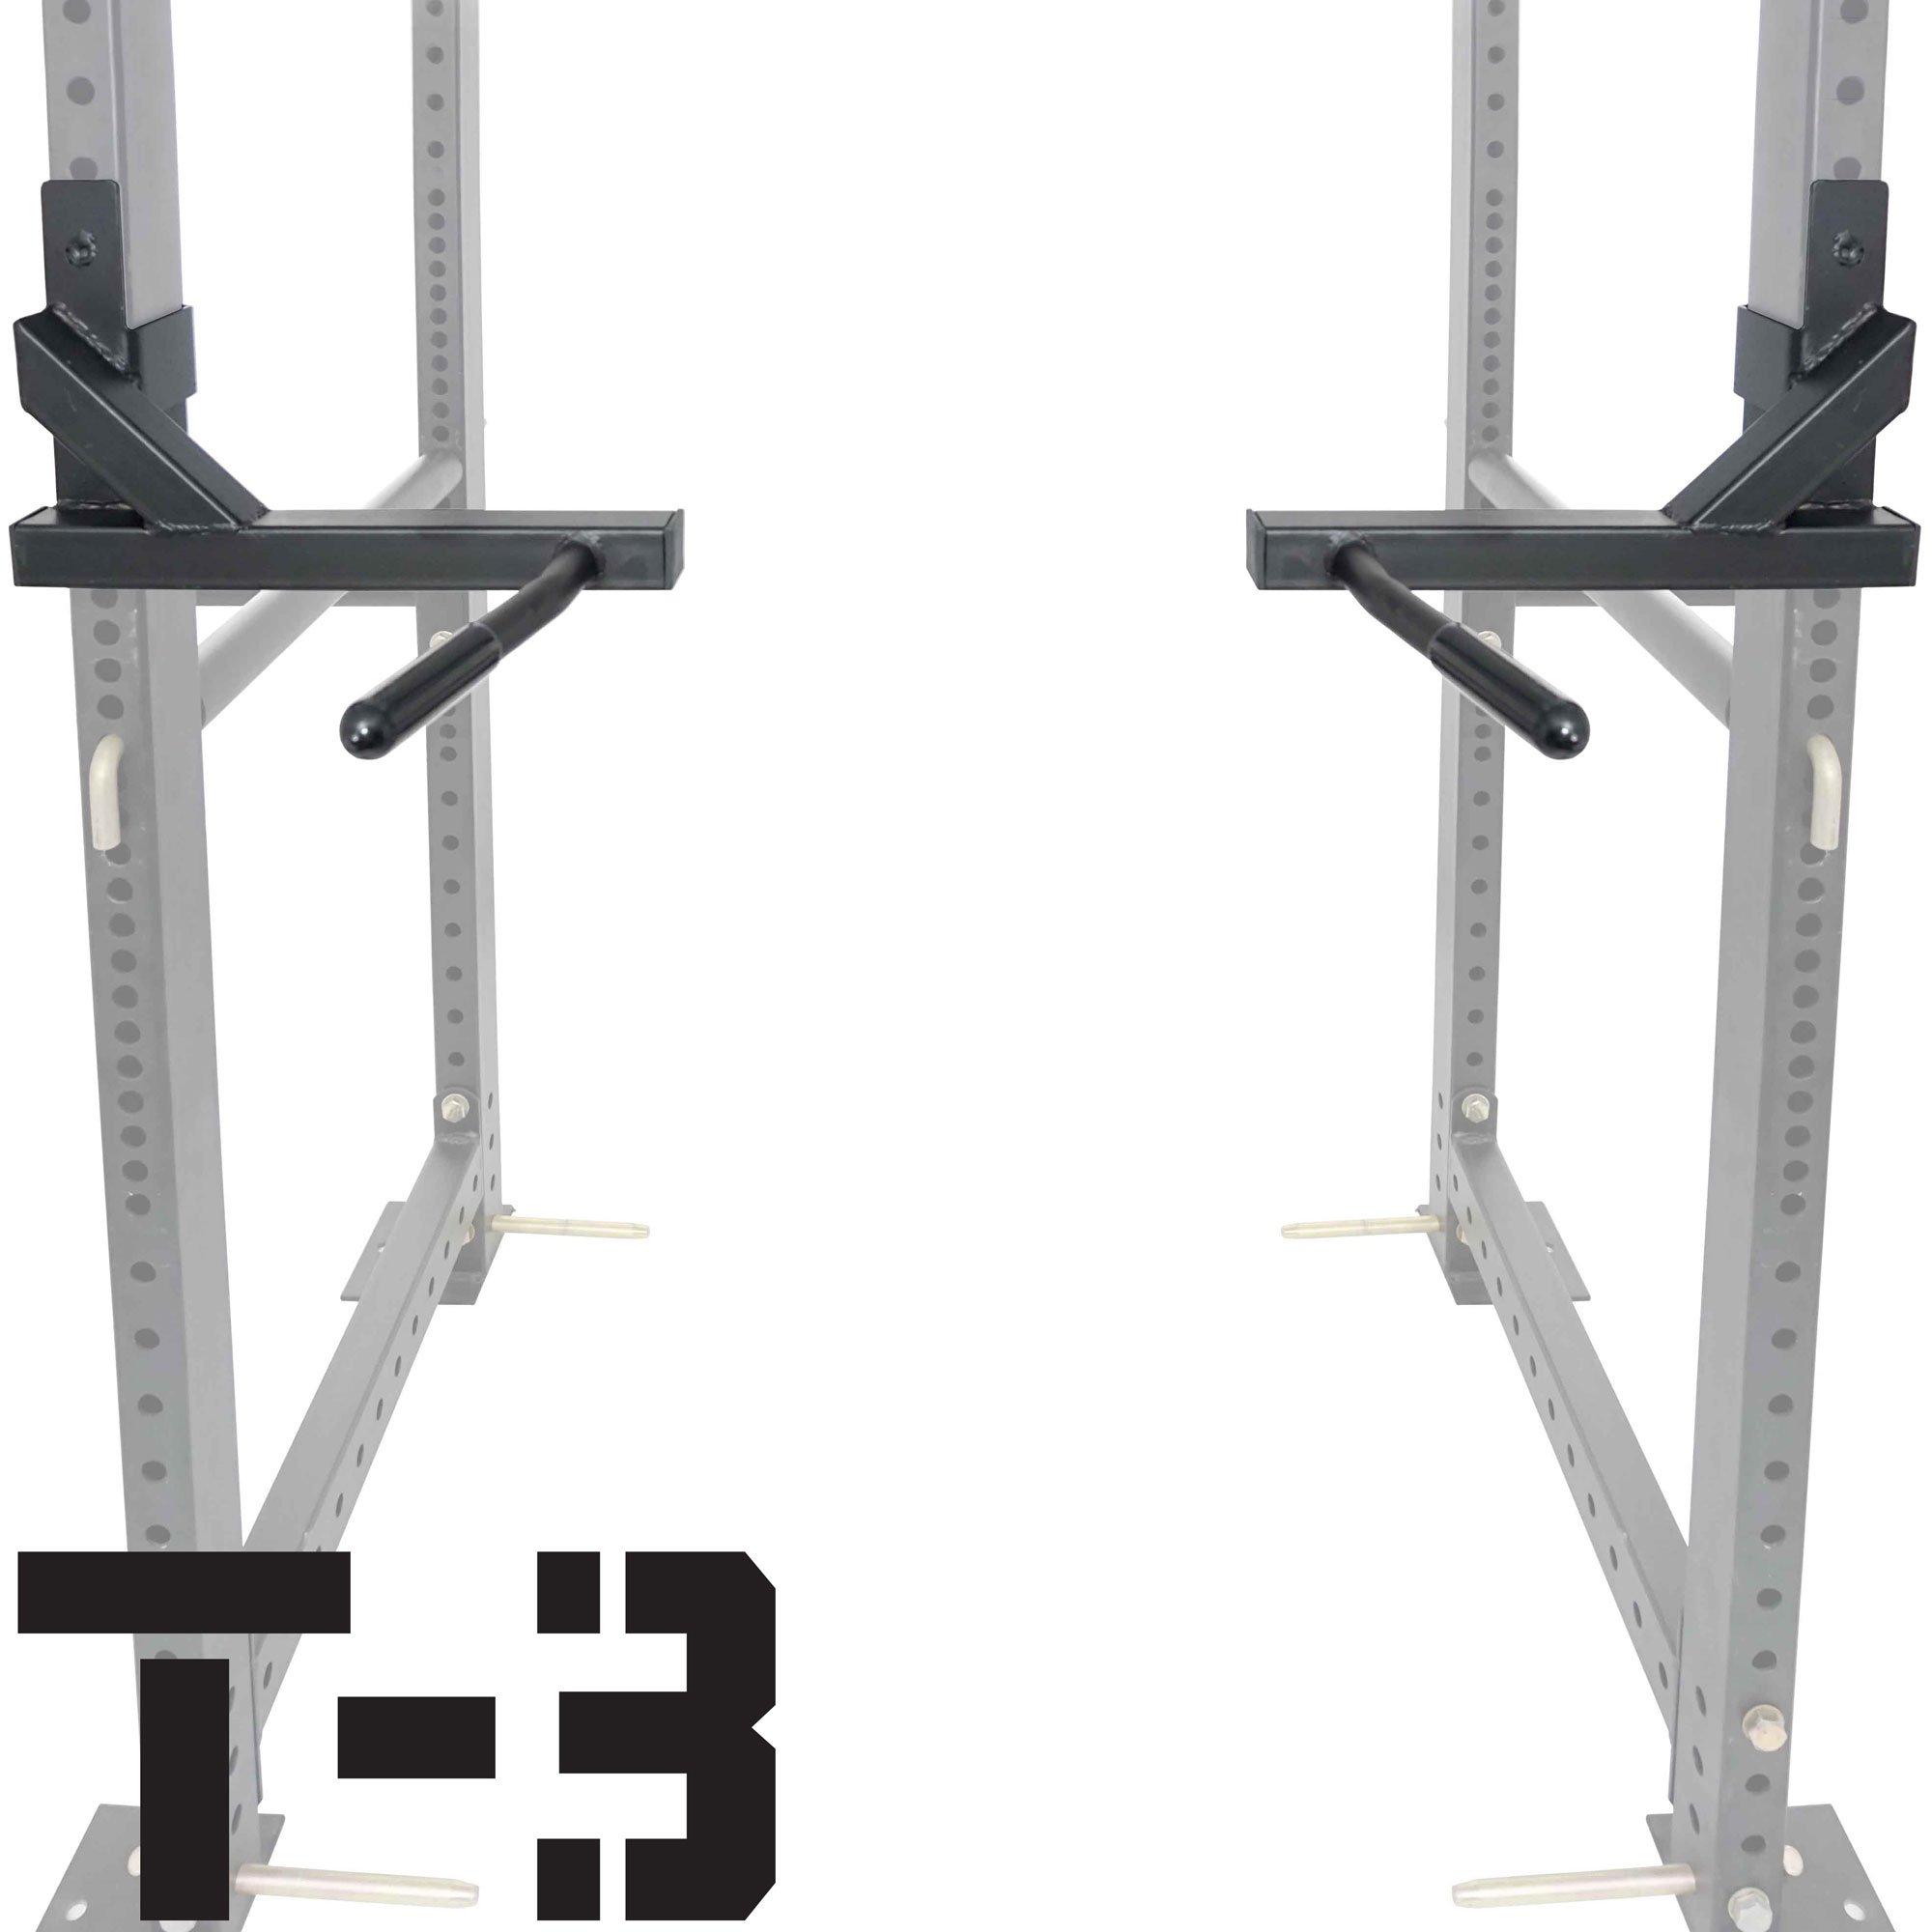 Titan T-3 Series Dip Attachment Bars for 2''x3'' HD Power Rack Strength Training